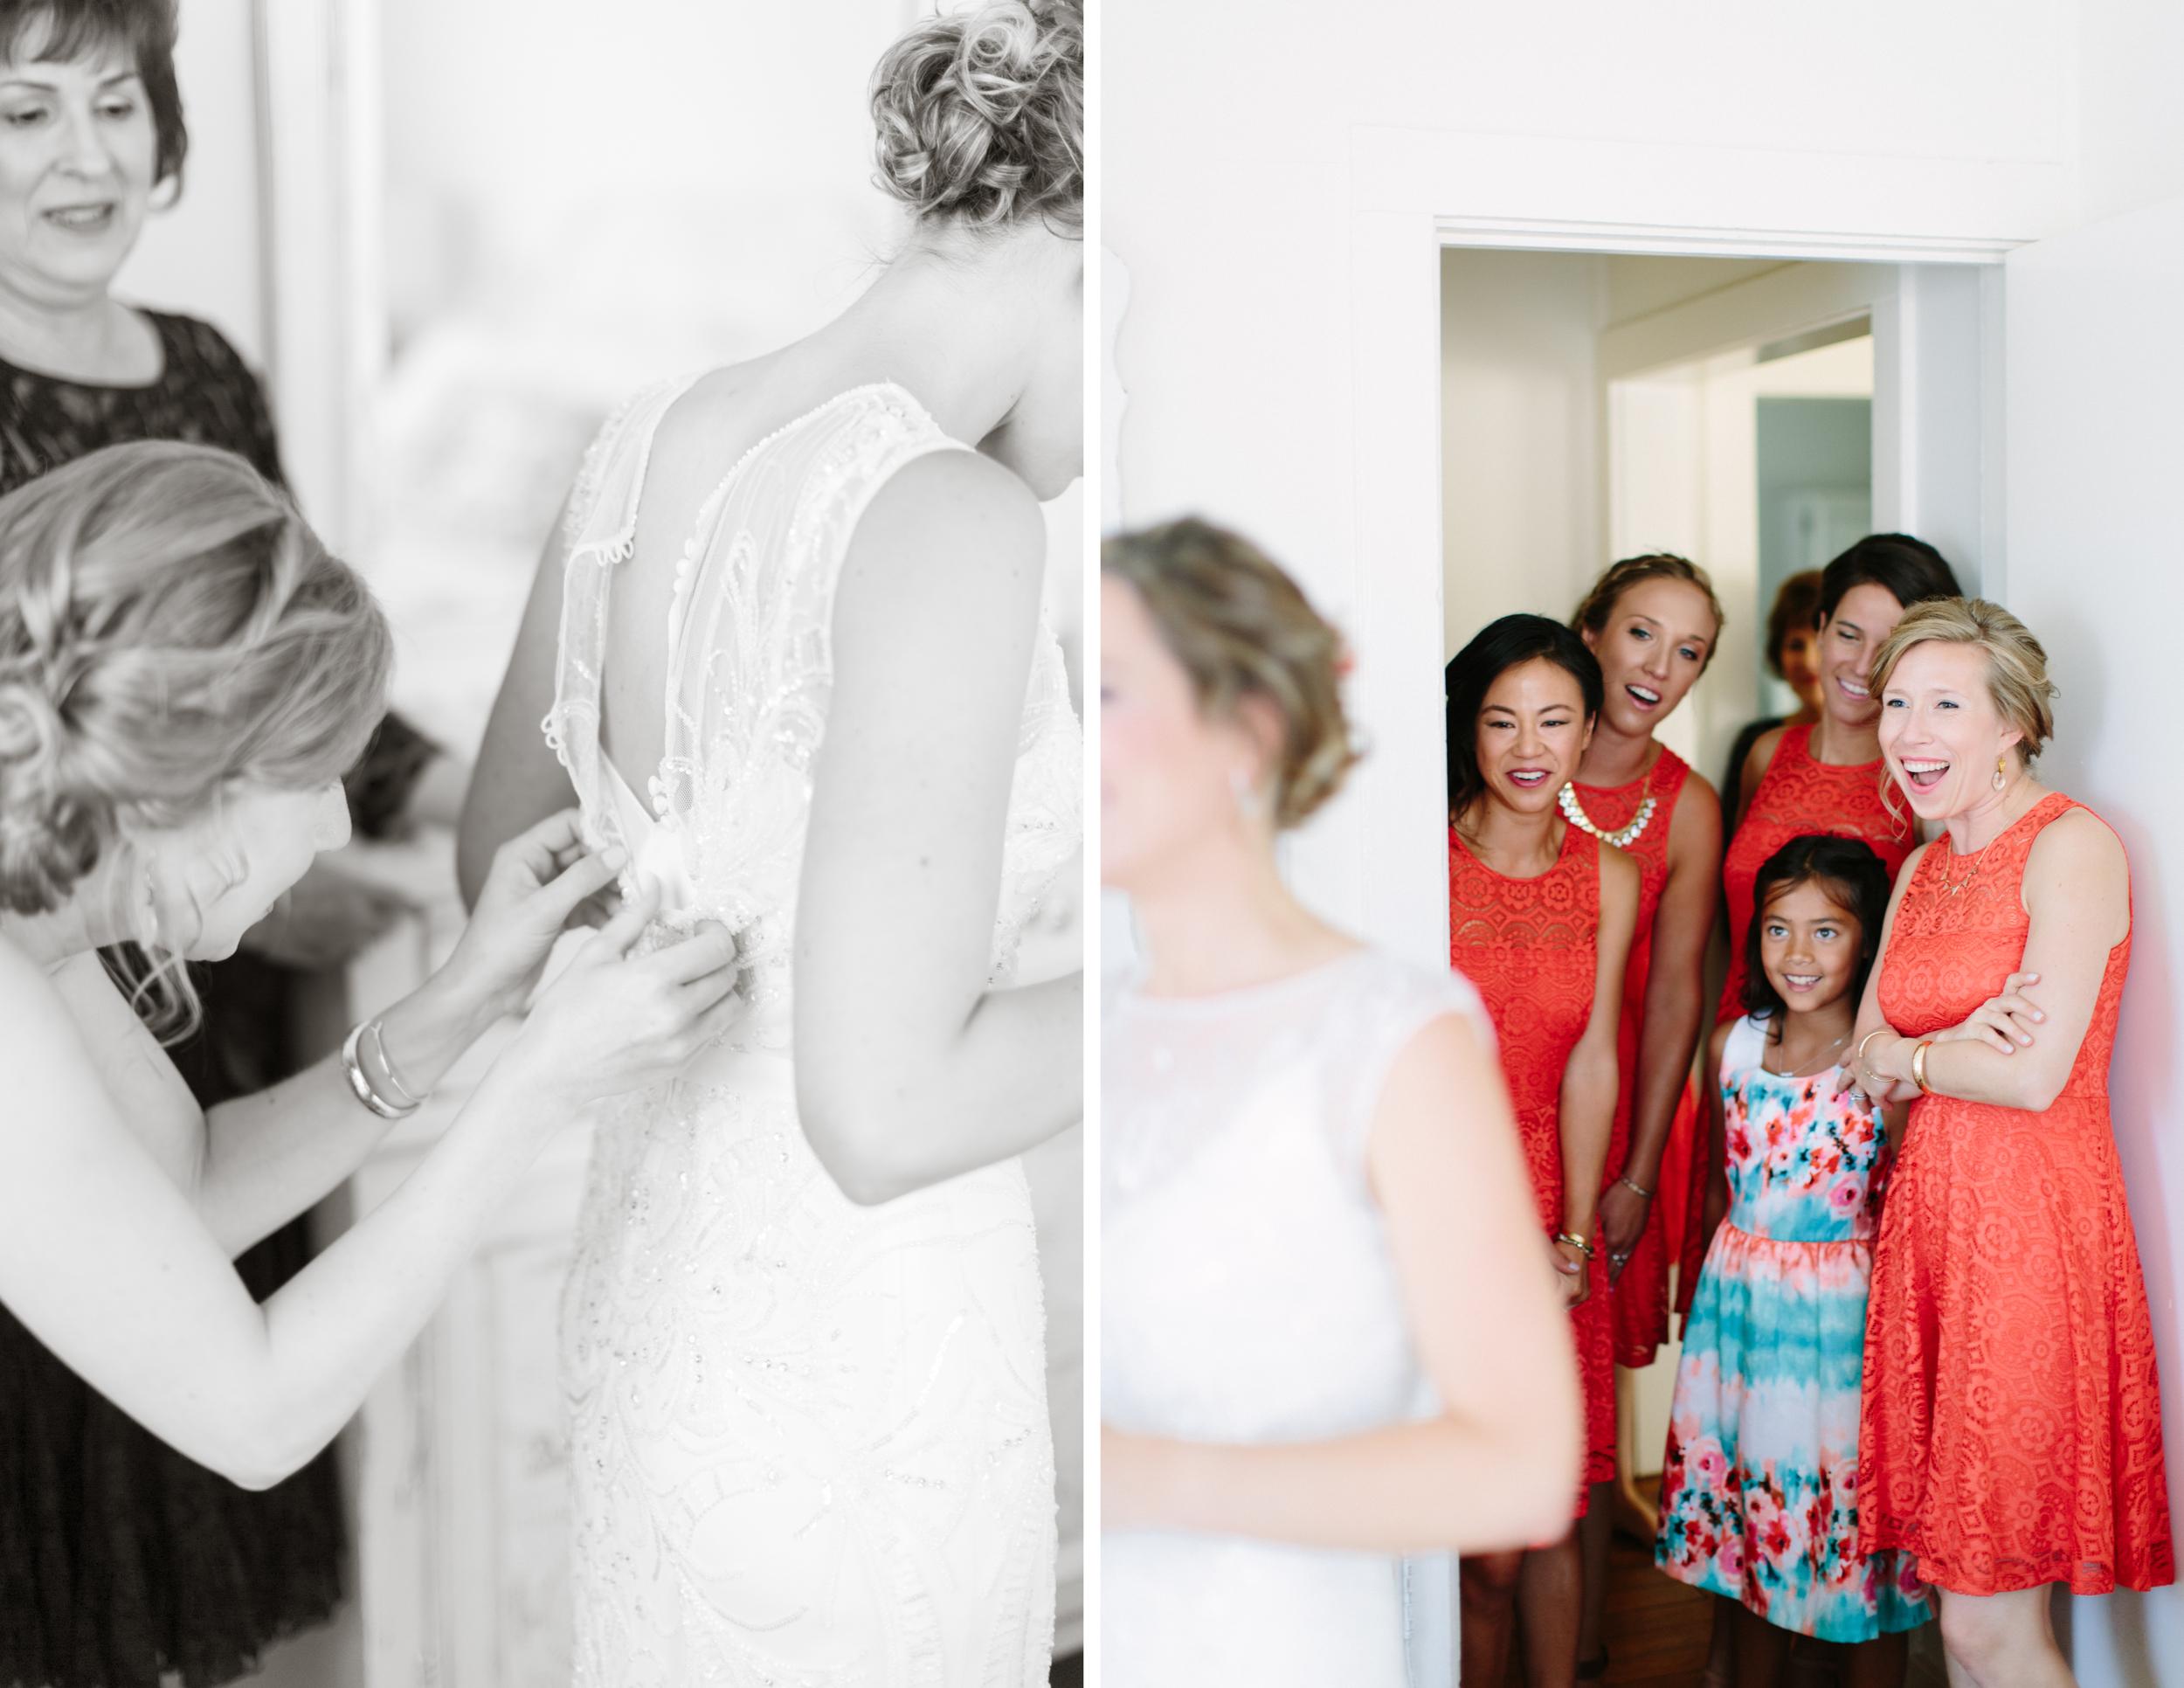 cornerstone sonoma wedding 4.jpg